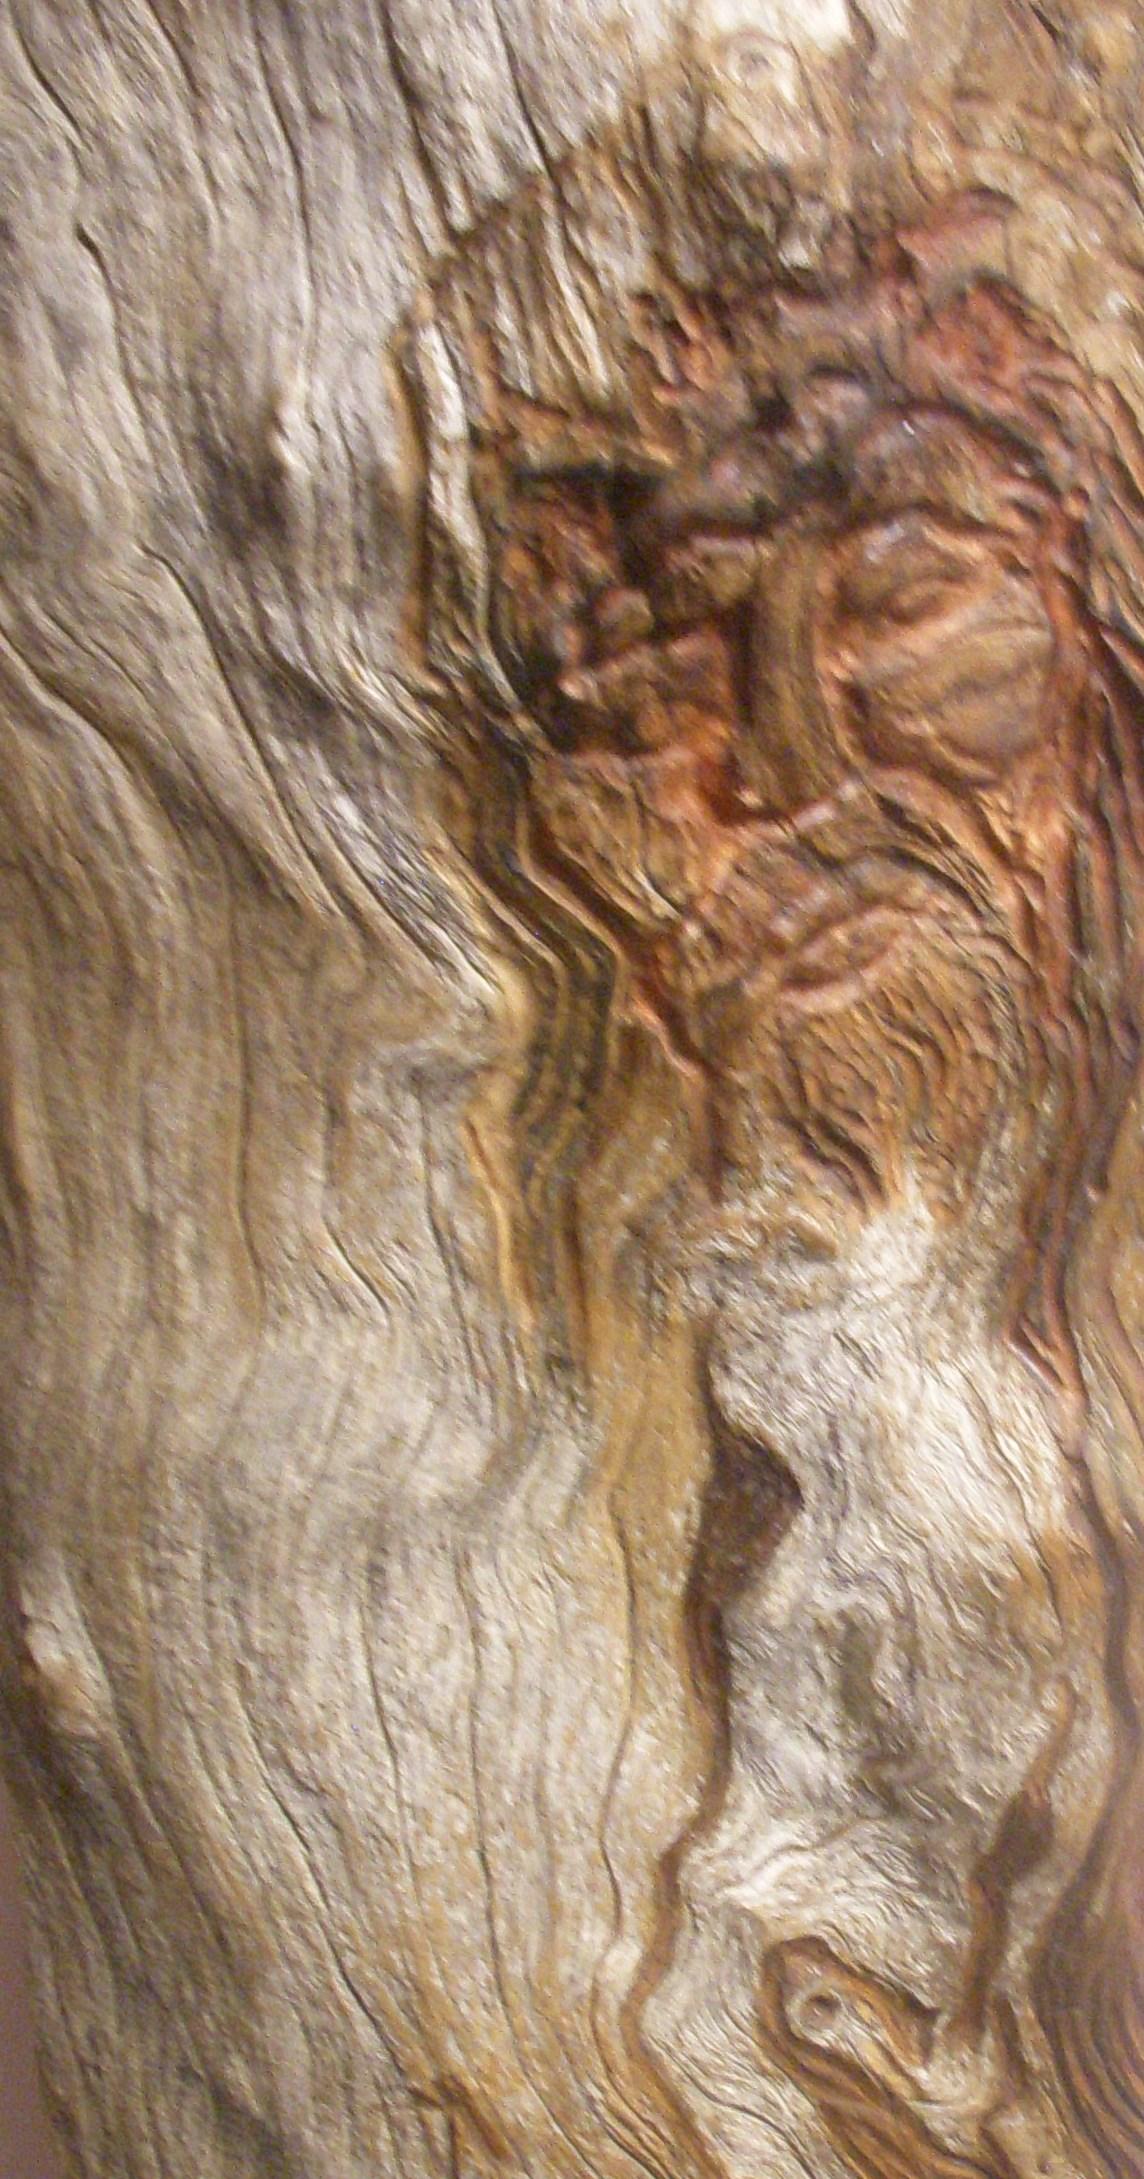 wood carving art of Jesus